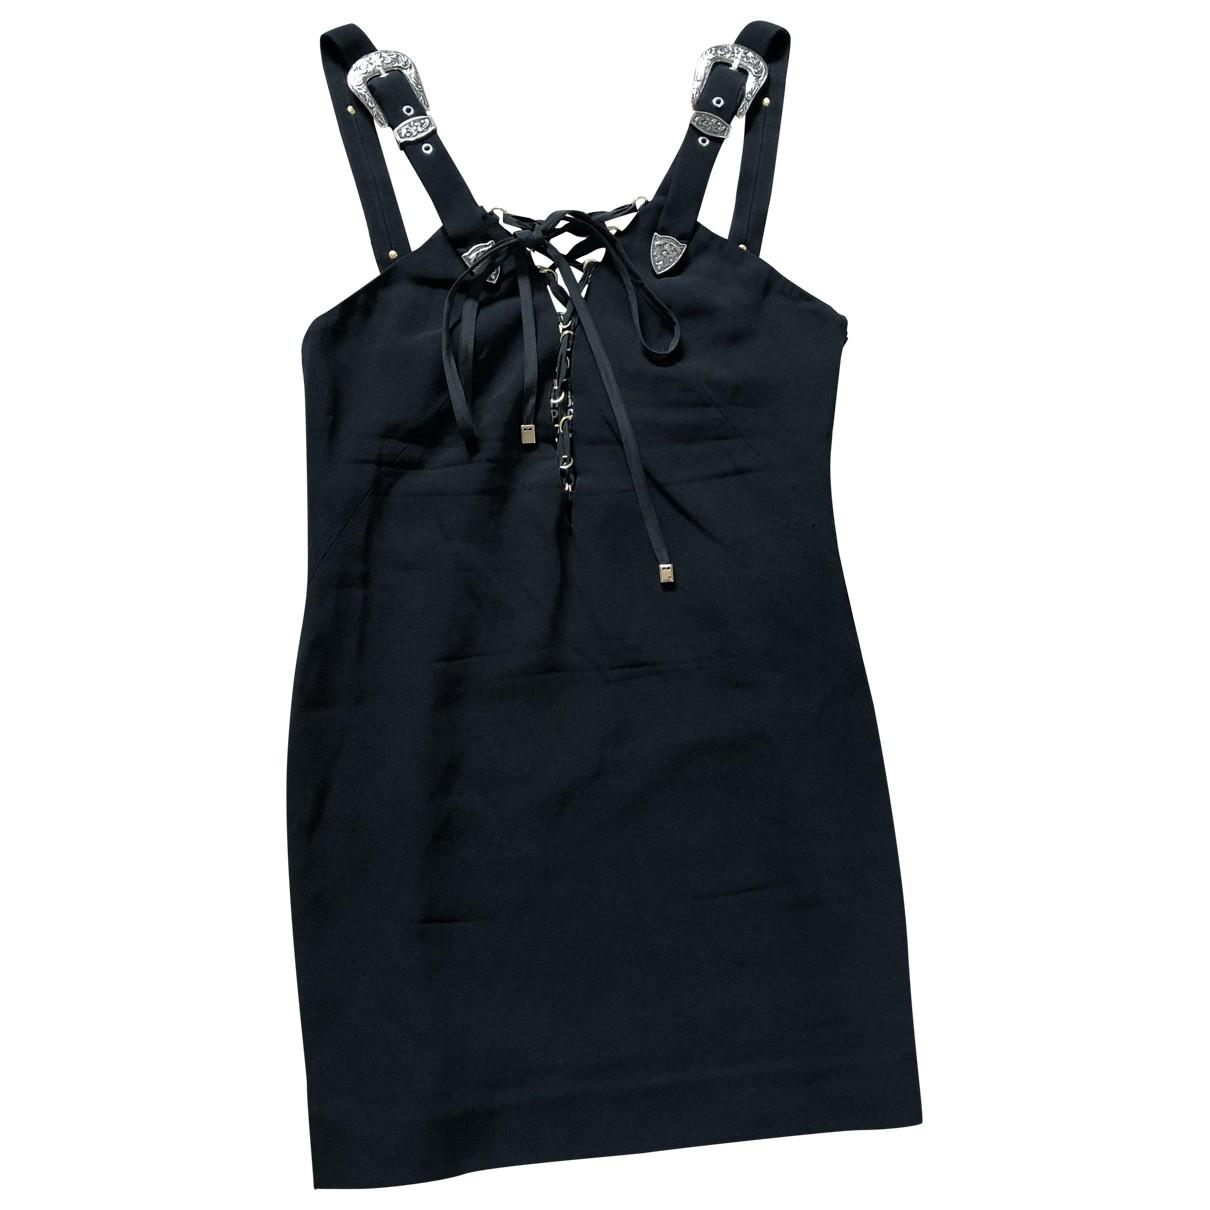 Fausto Puglisi \N Black dress for Women 38 IT